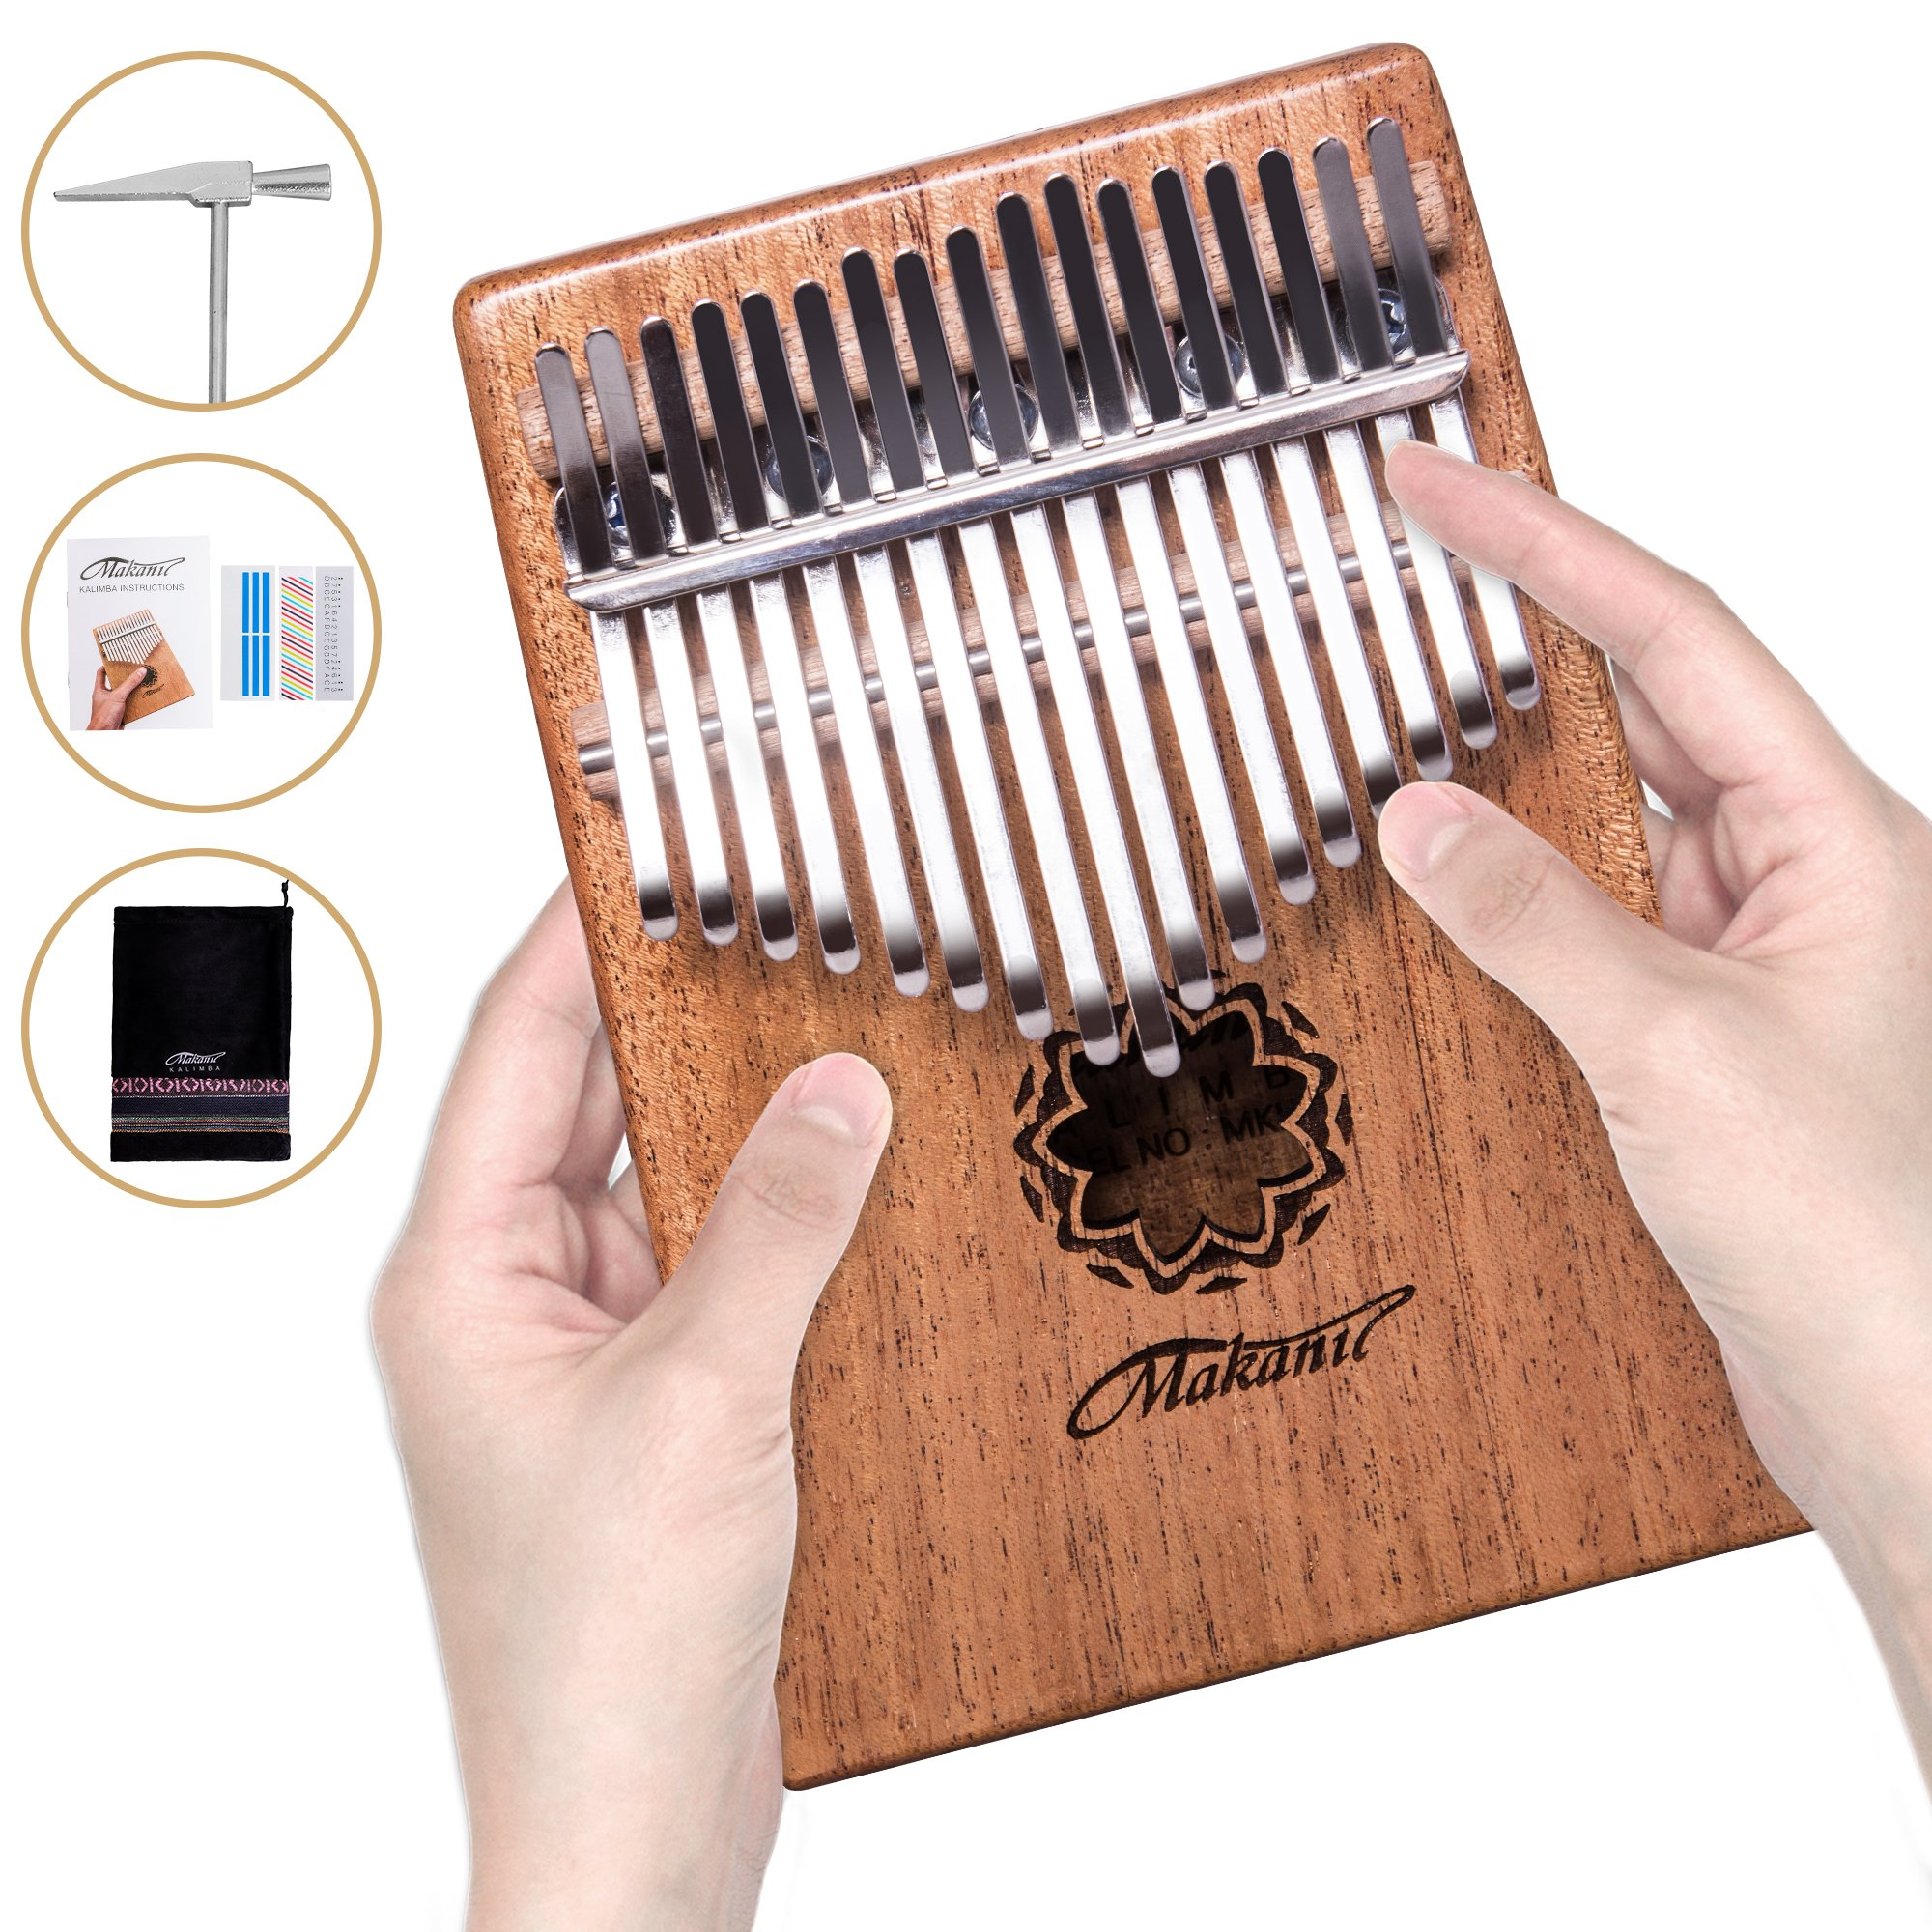 Makanu Kalimba 17 Key ,Thumb Piano ,Solid Finger Piano Mahogany Body,Set of 5 -Tuning hammer,Study instruction,Tune and color stickers,Portable piano bag,Packing case